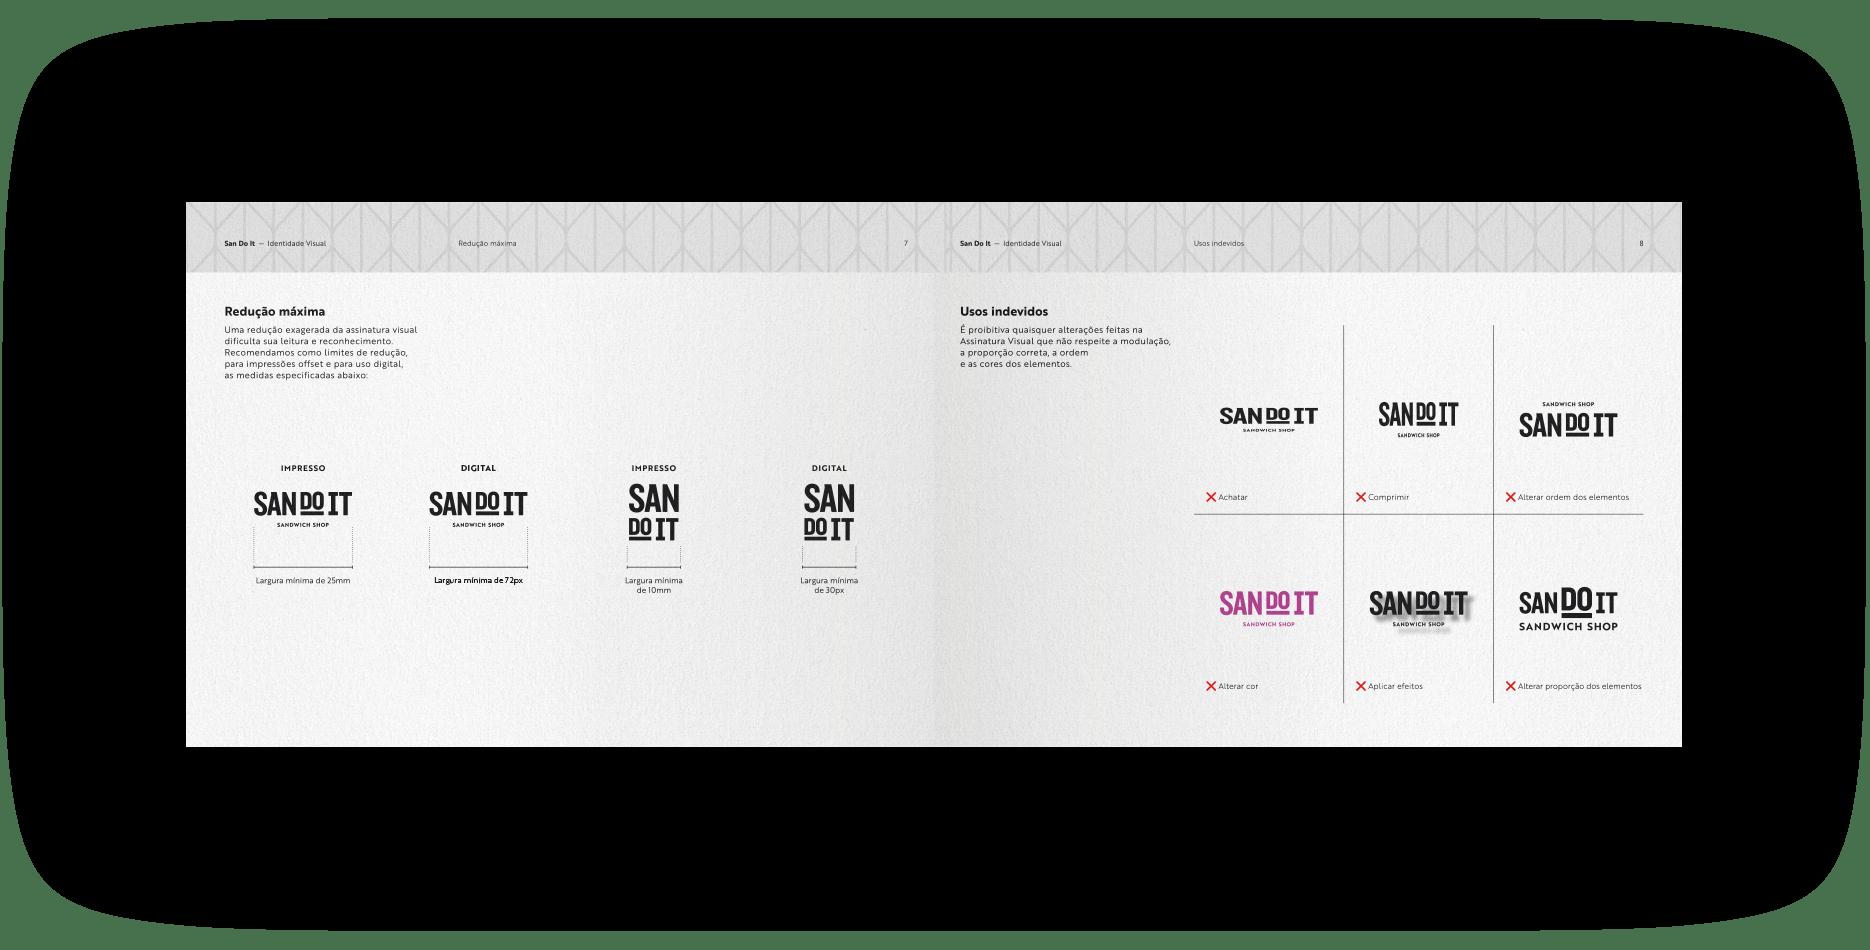 04-sandoit-strategy-brandbook